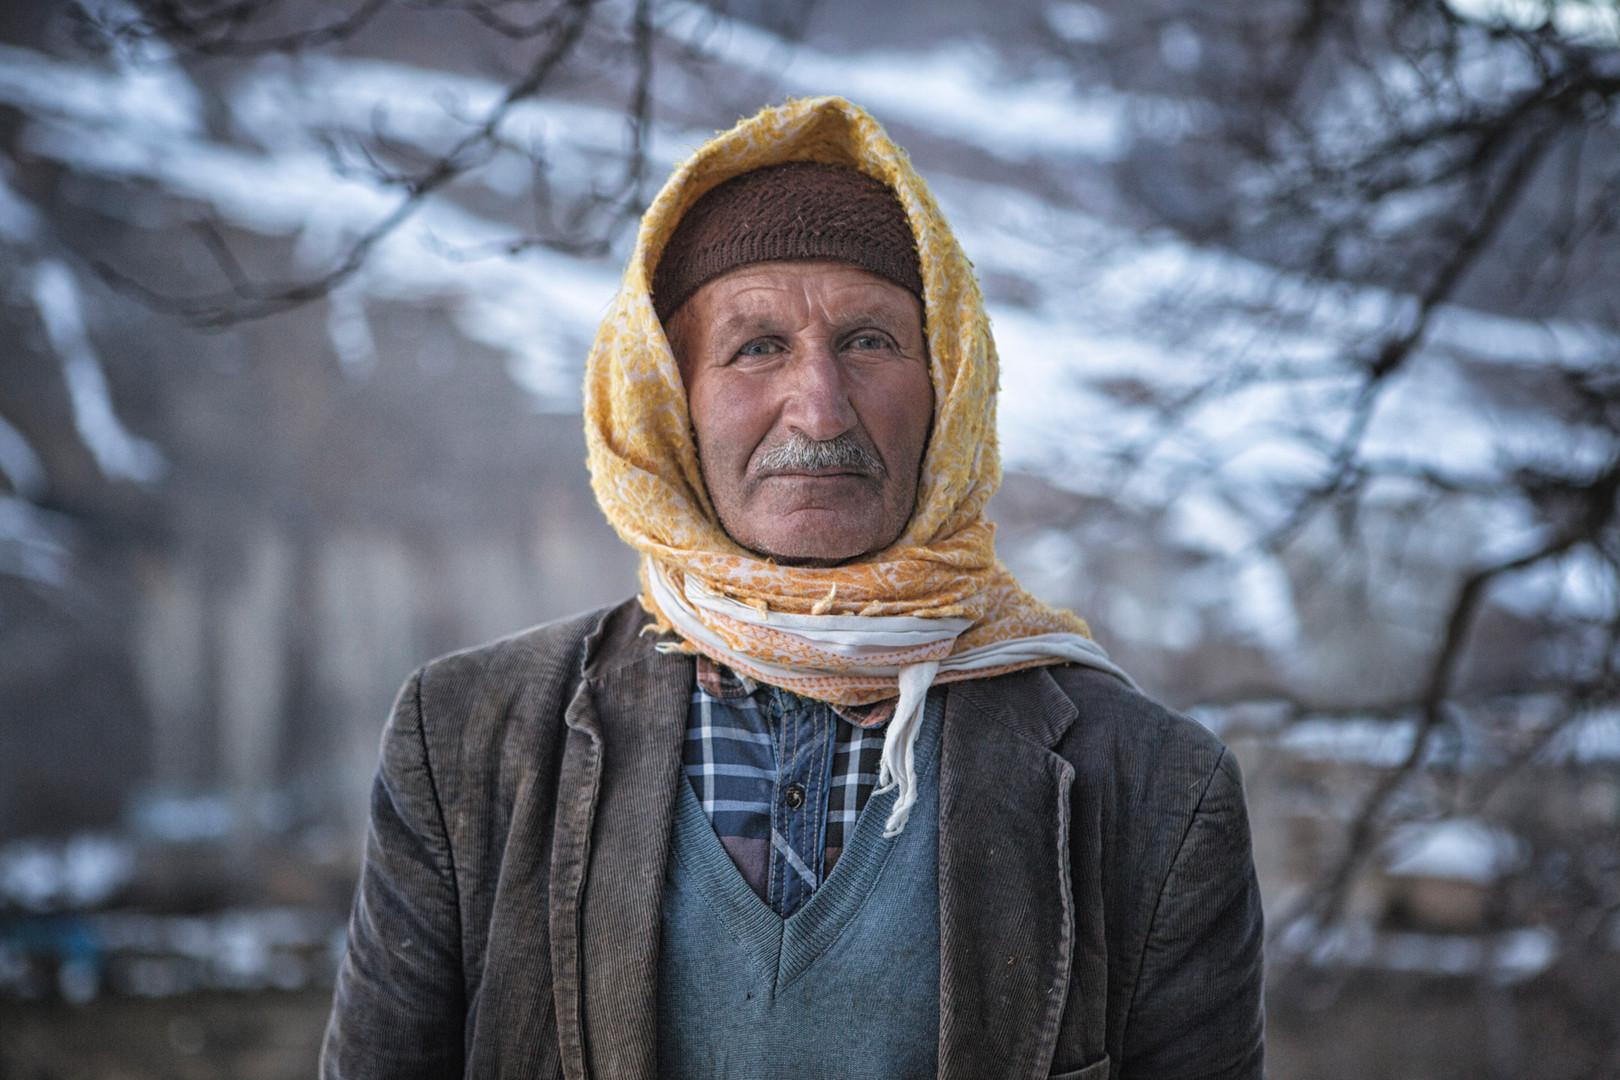 The Villager in Yellow Hood. Alacayar, Van. February 2017.